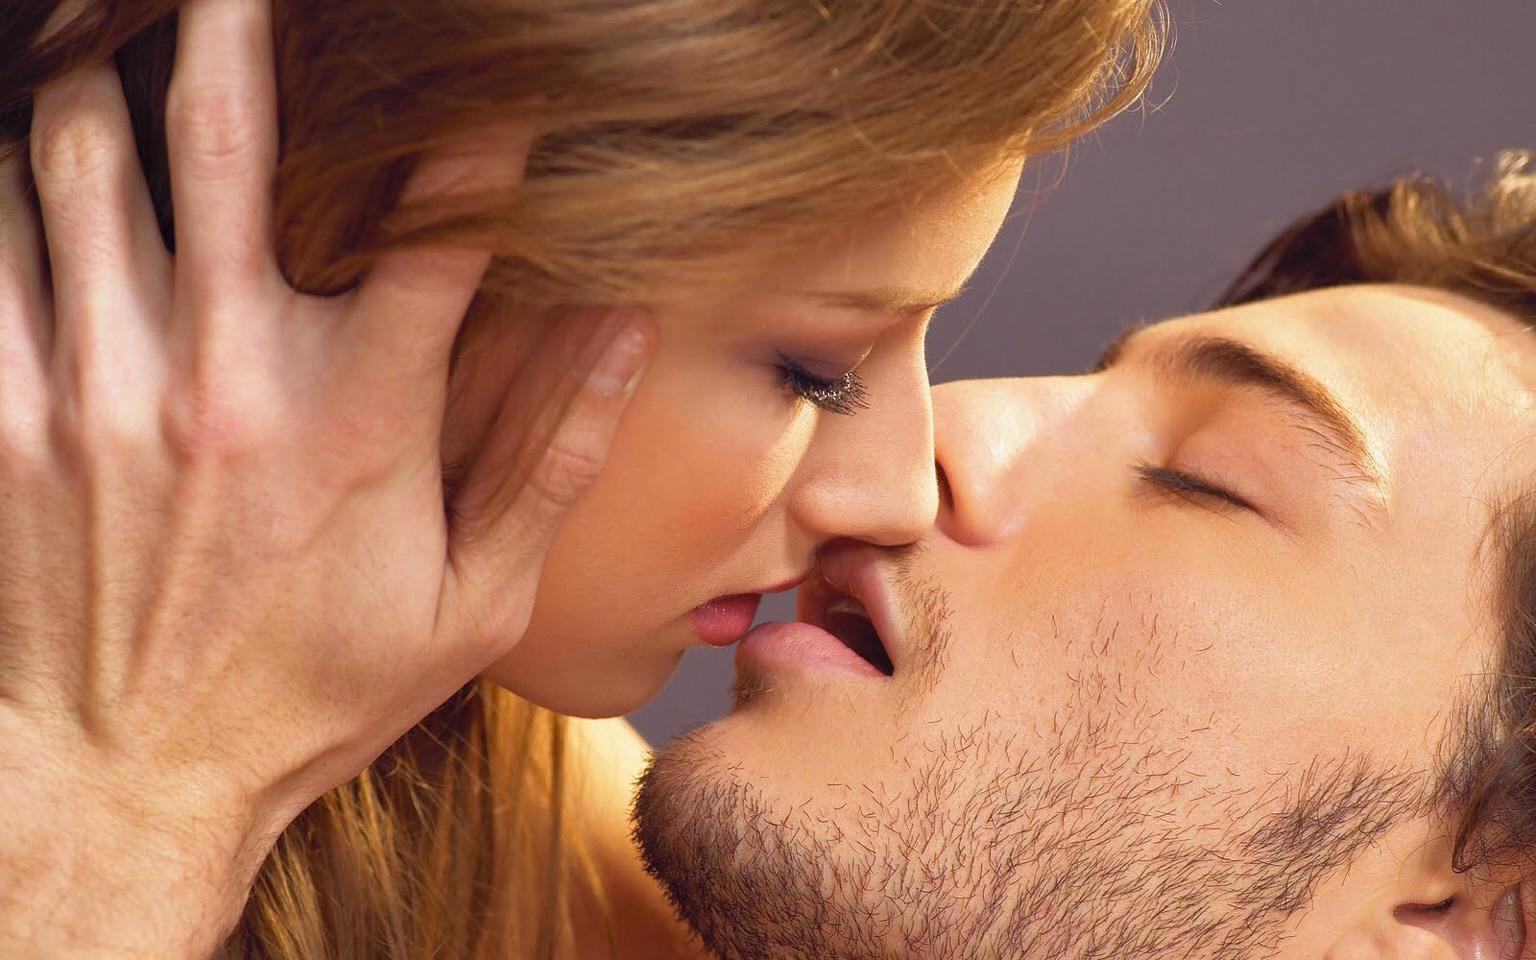 стоит мужчина поцеловал мужчину видео аналом любят